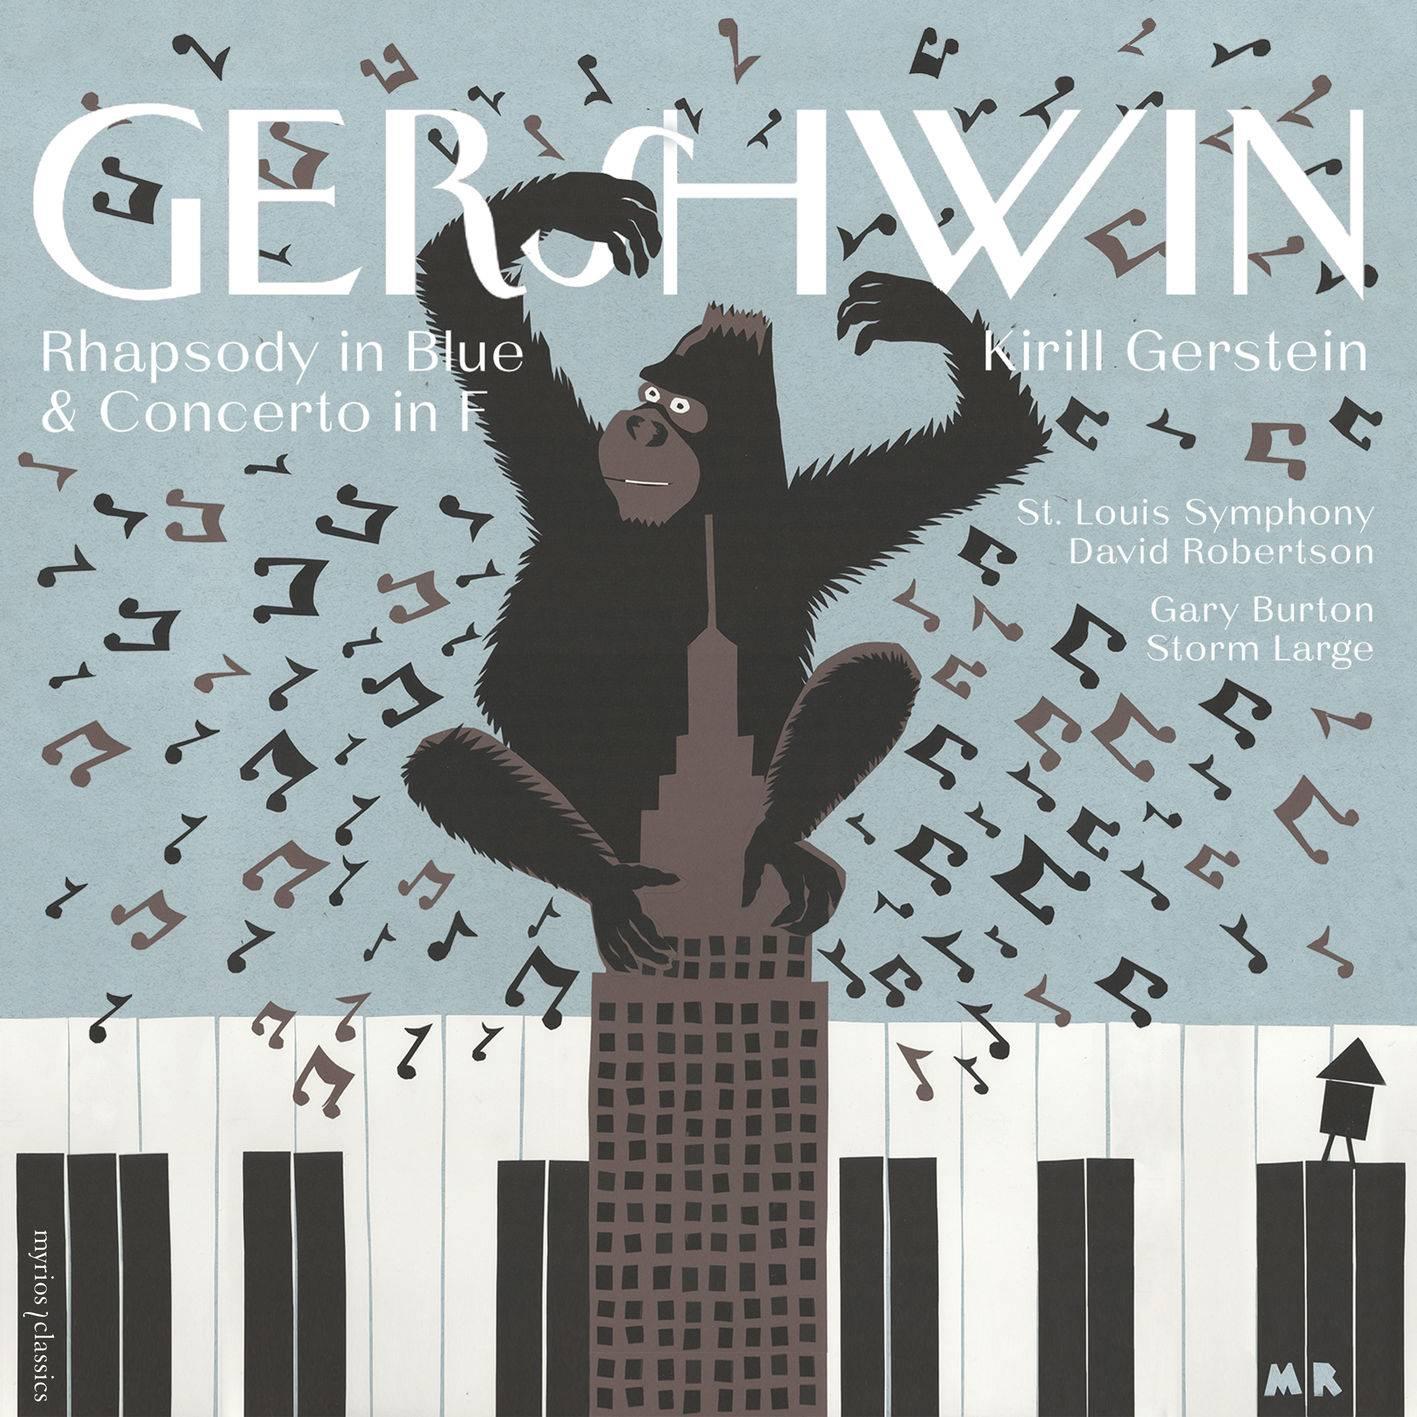 Kirill Gerstein - The Gershwin Moment: Rhapsody in Blue & Concerto (2018)